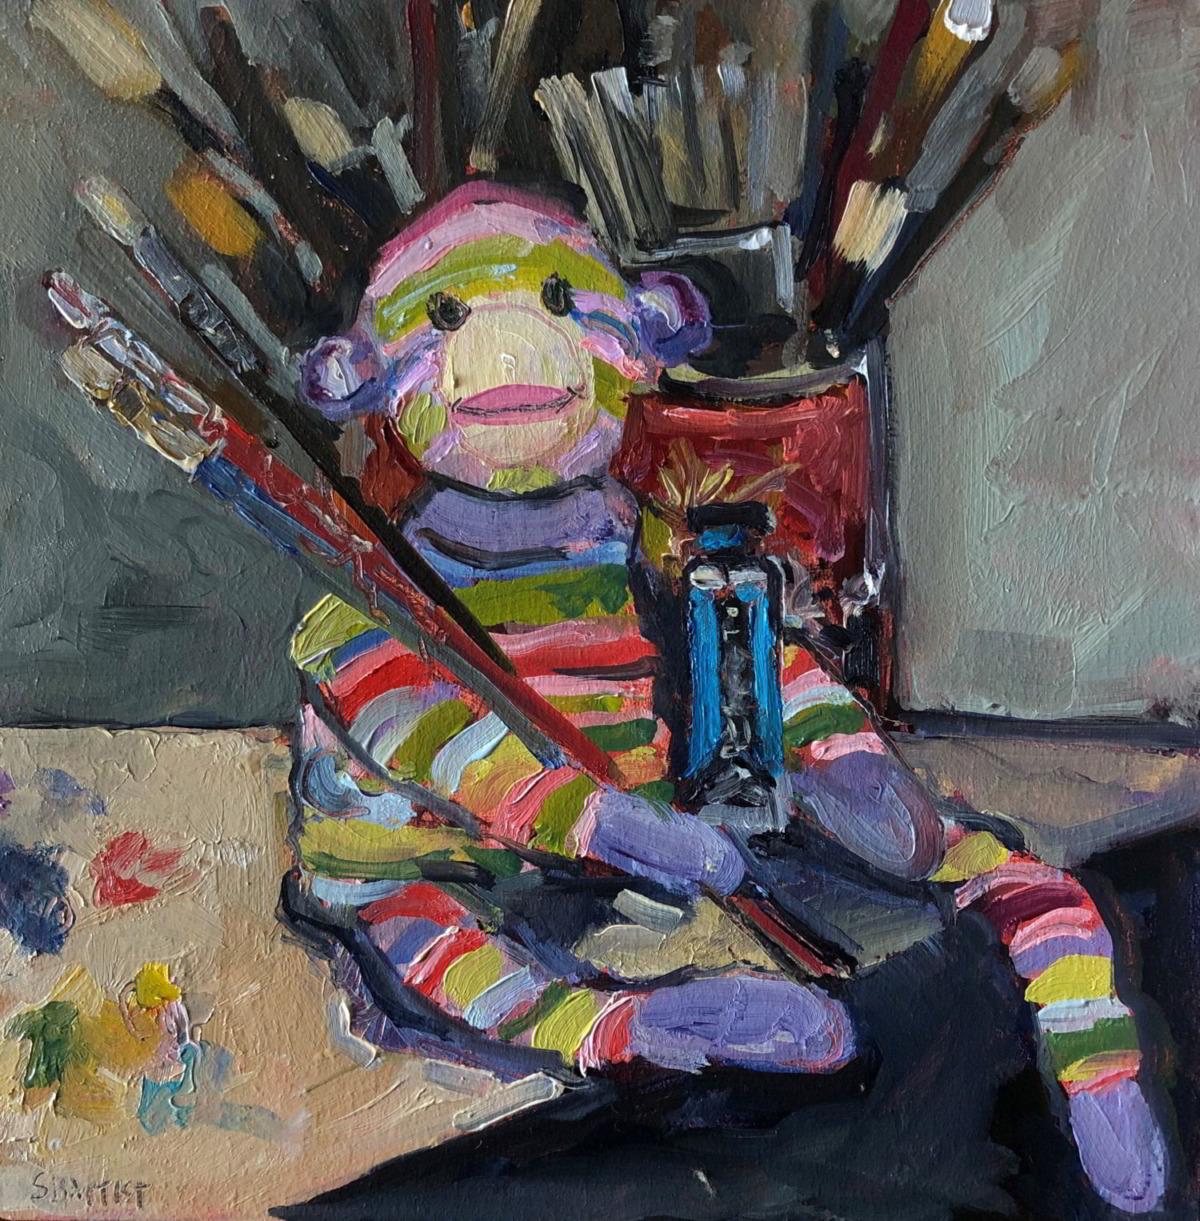 YOUR ARTWORK IS AMAZING.jpg